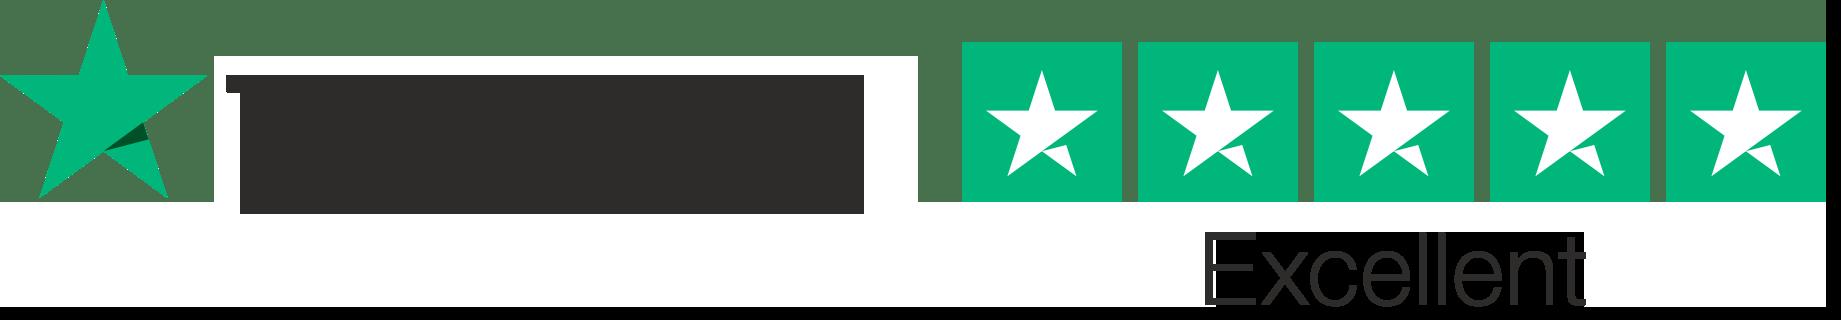 TrustPilot 5 Star Excellent